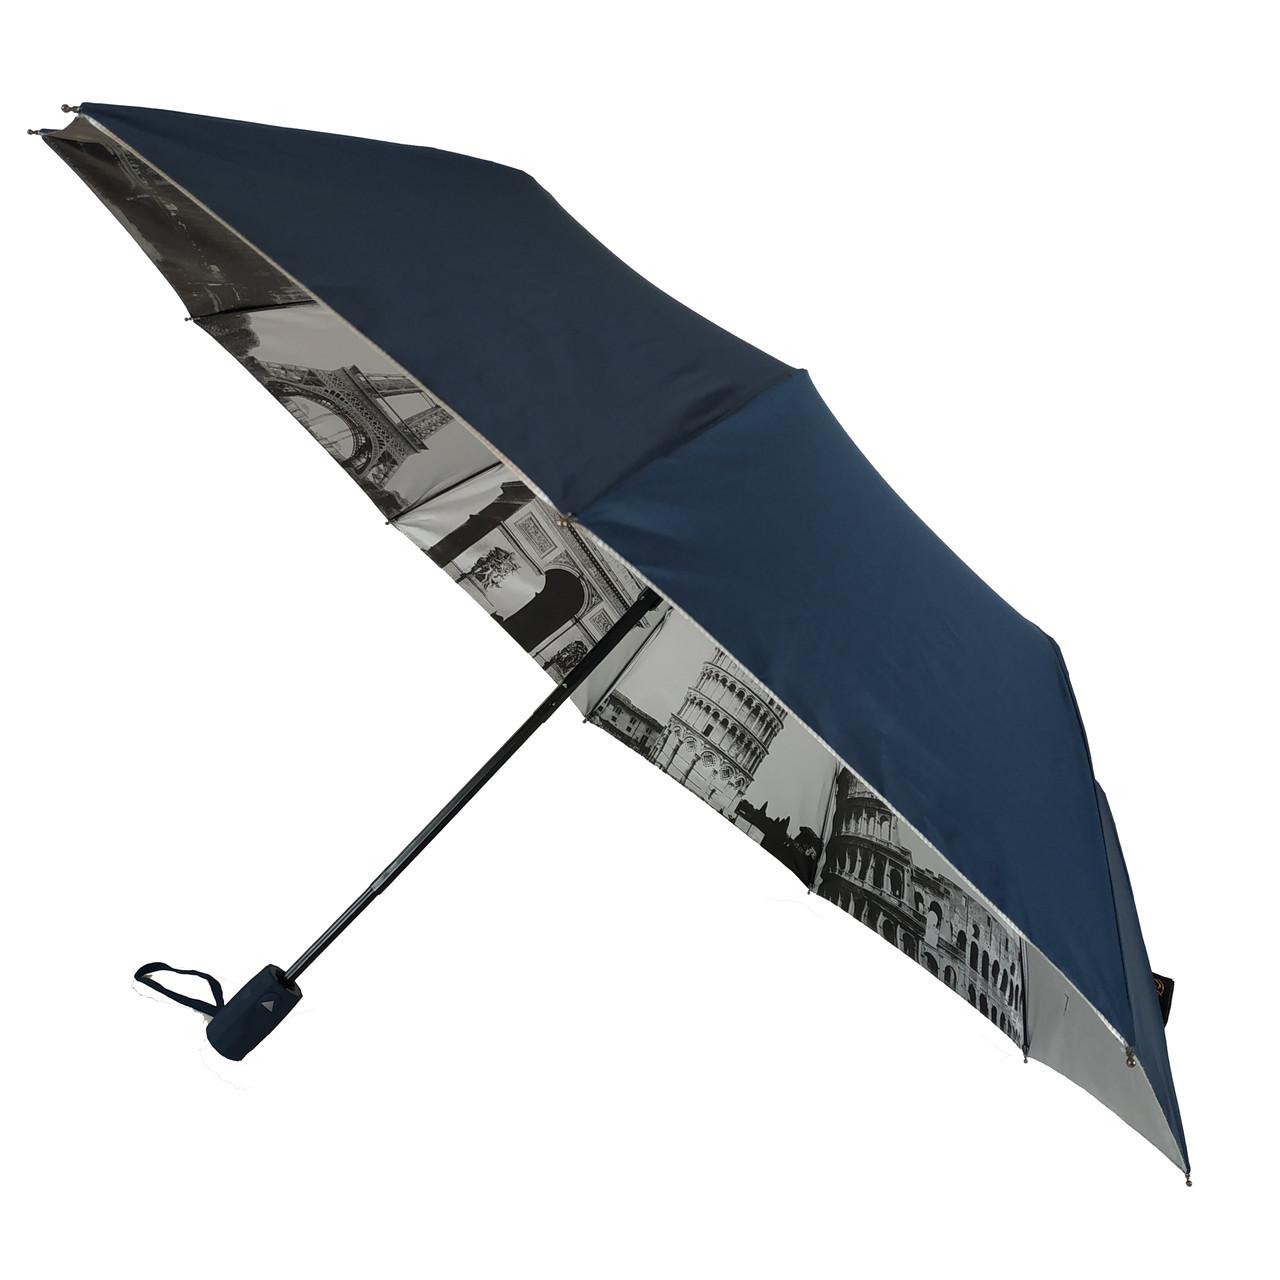 Зонтик полуавтомат Bellissimo Темно-синий 18315-8, КОД: 1234701, фото 1